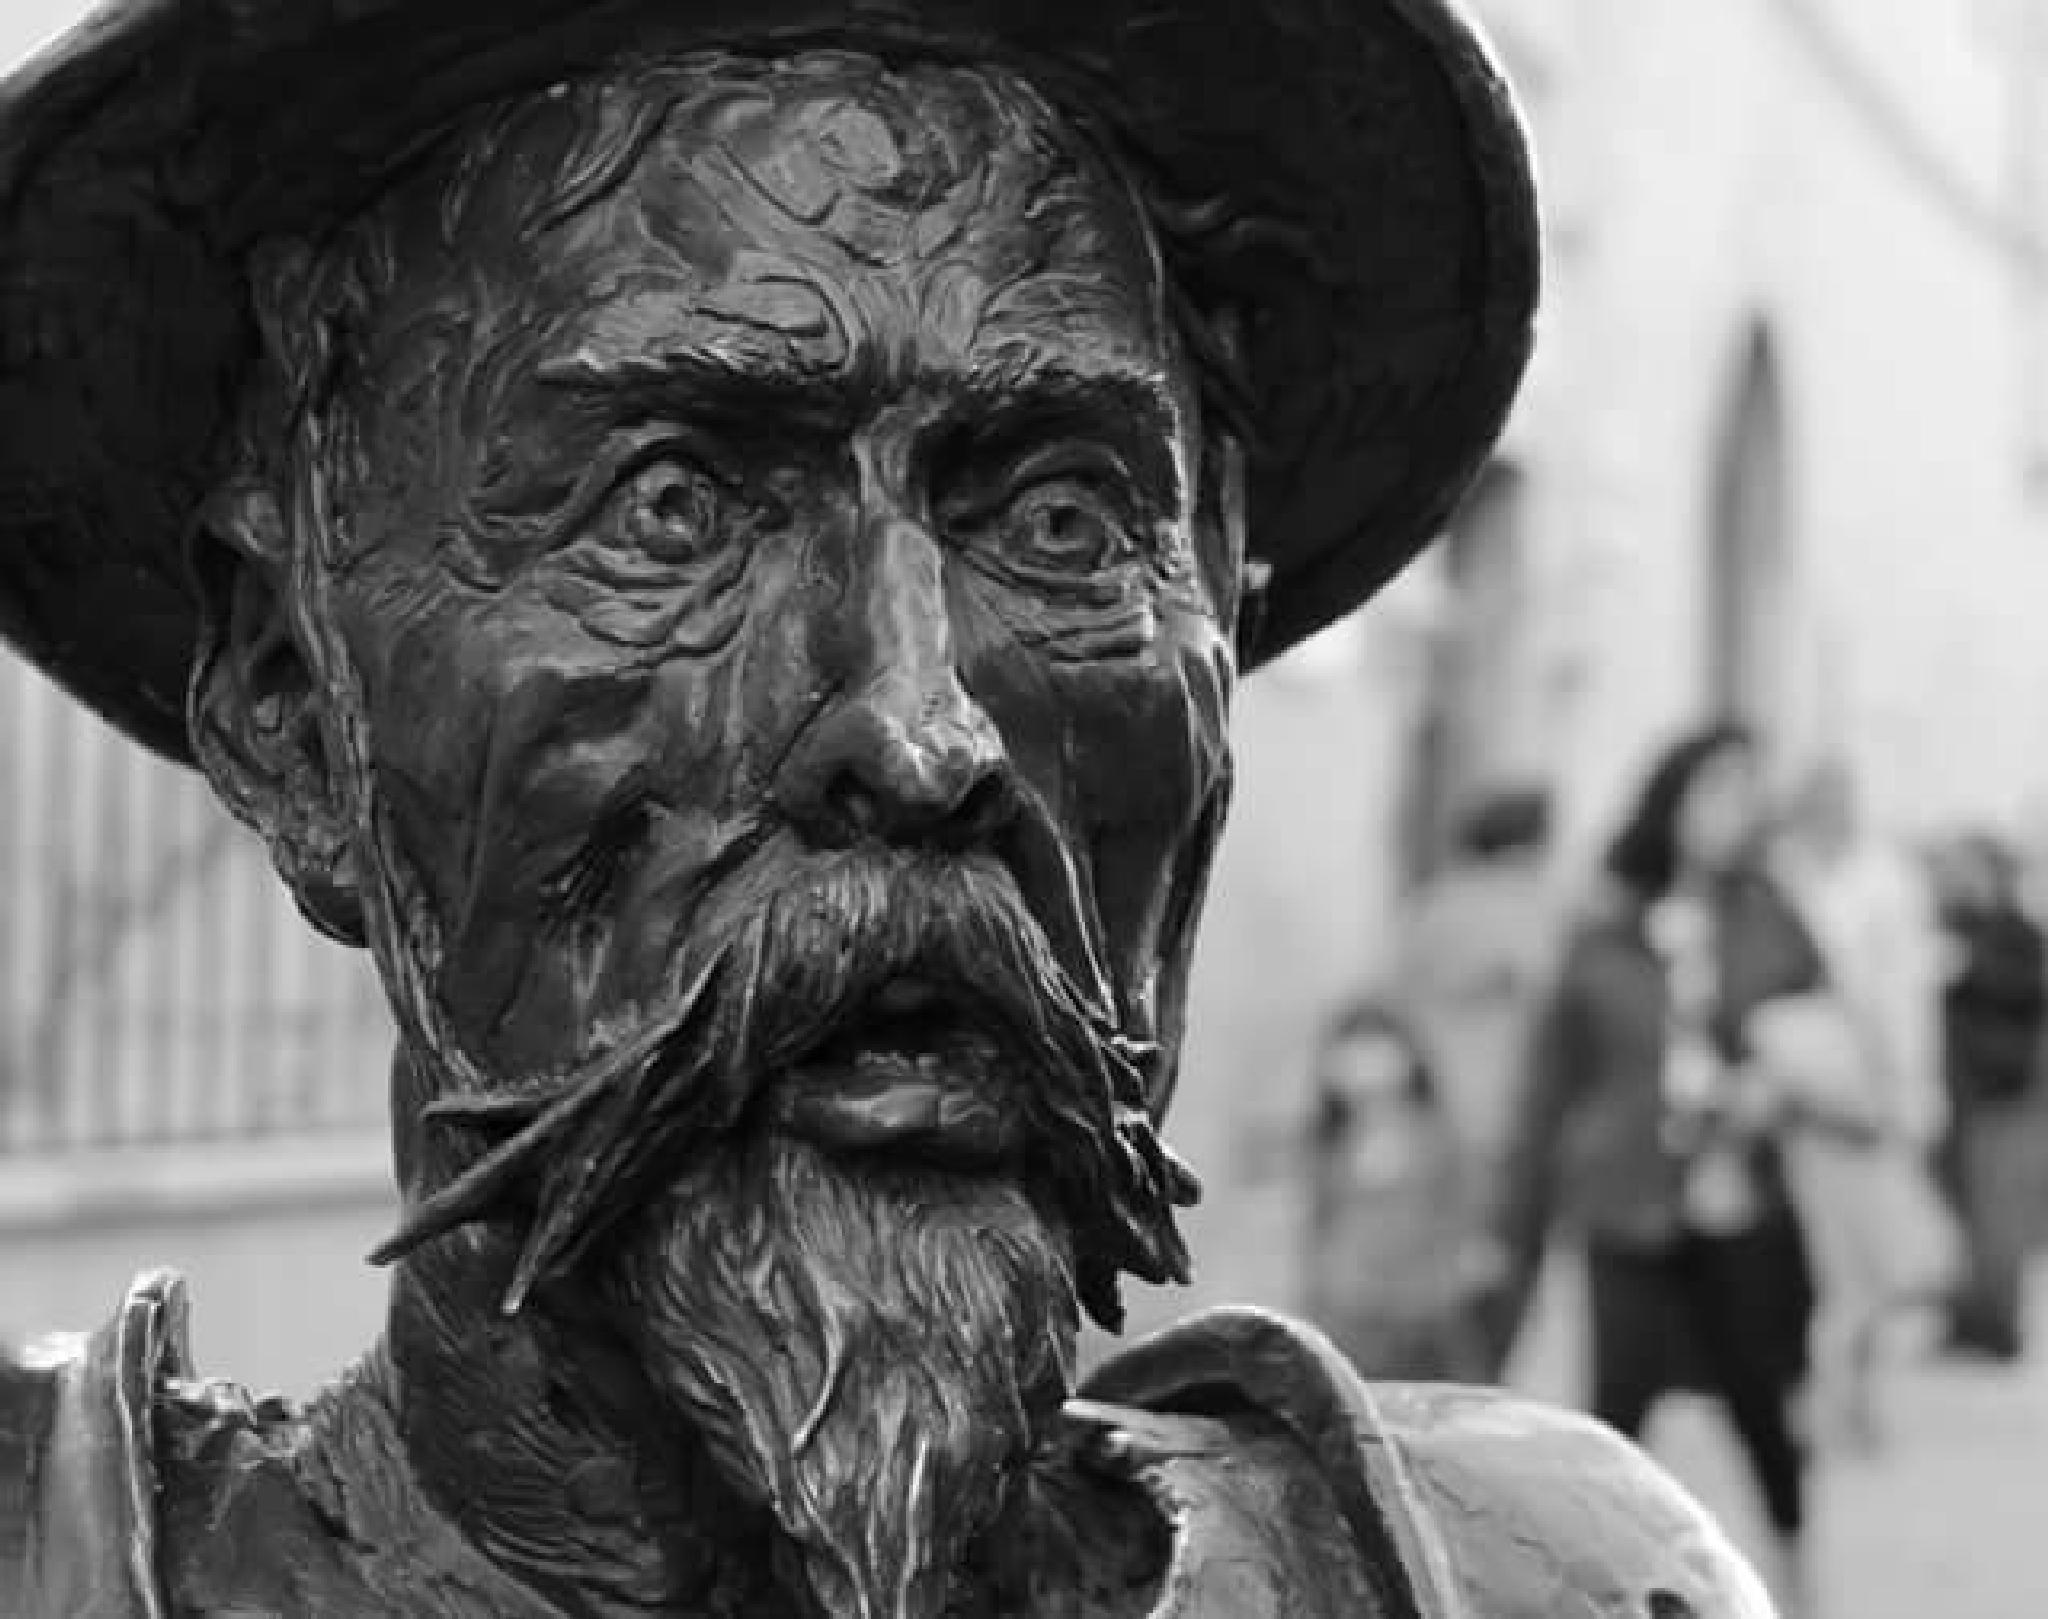 Don Quijote's portrait  by lorenzo.lourencothierry